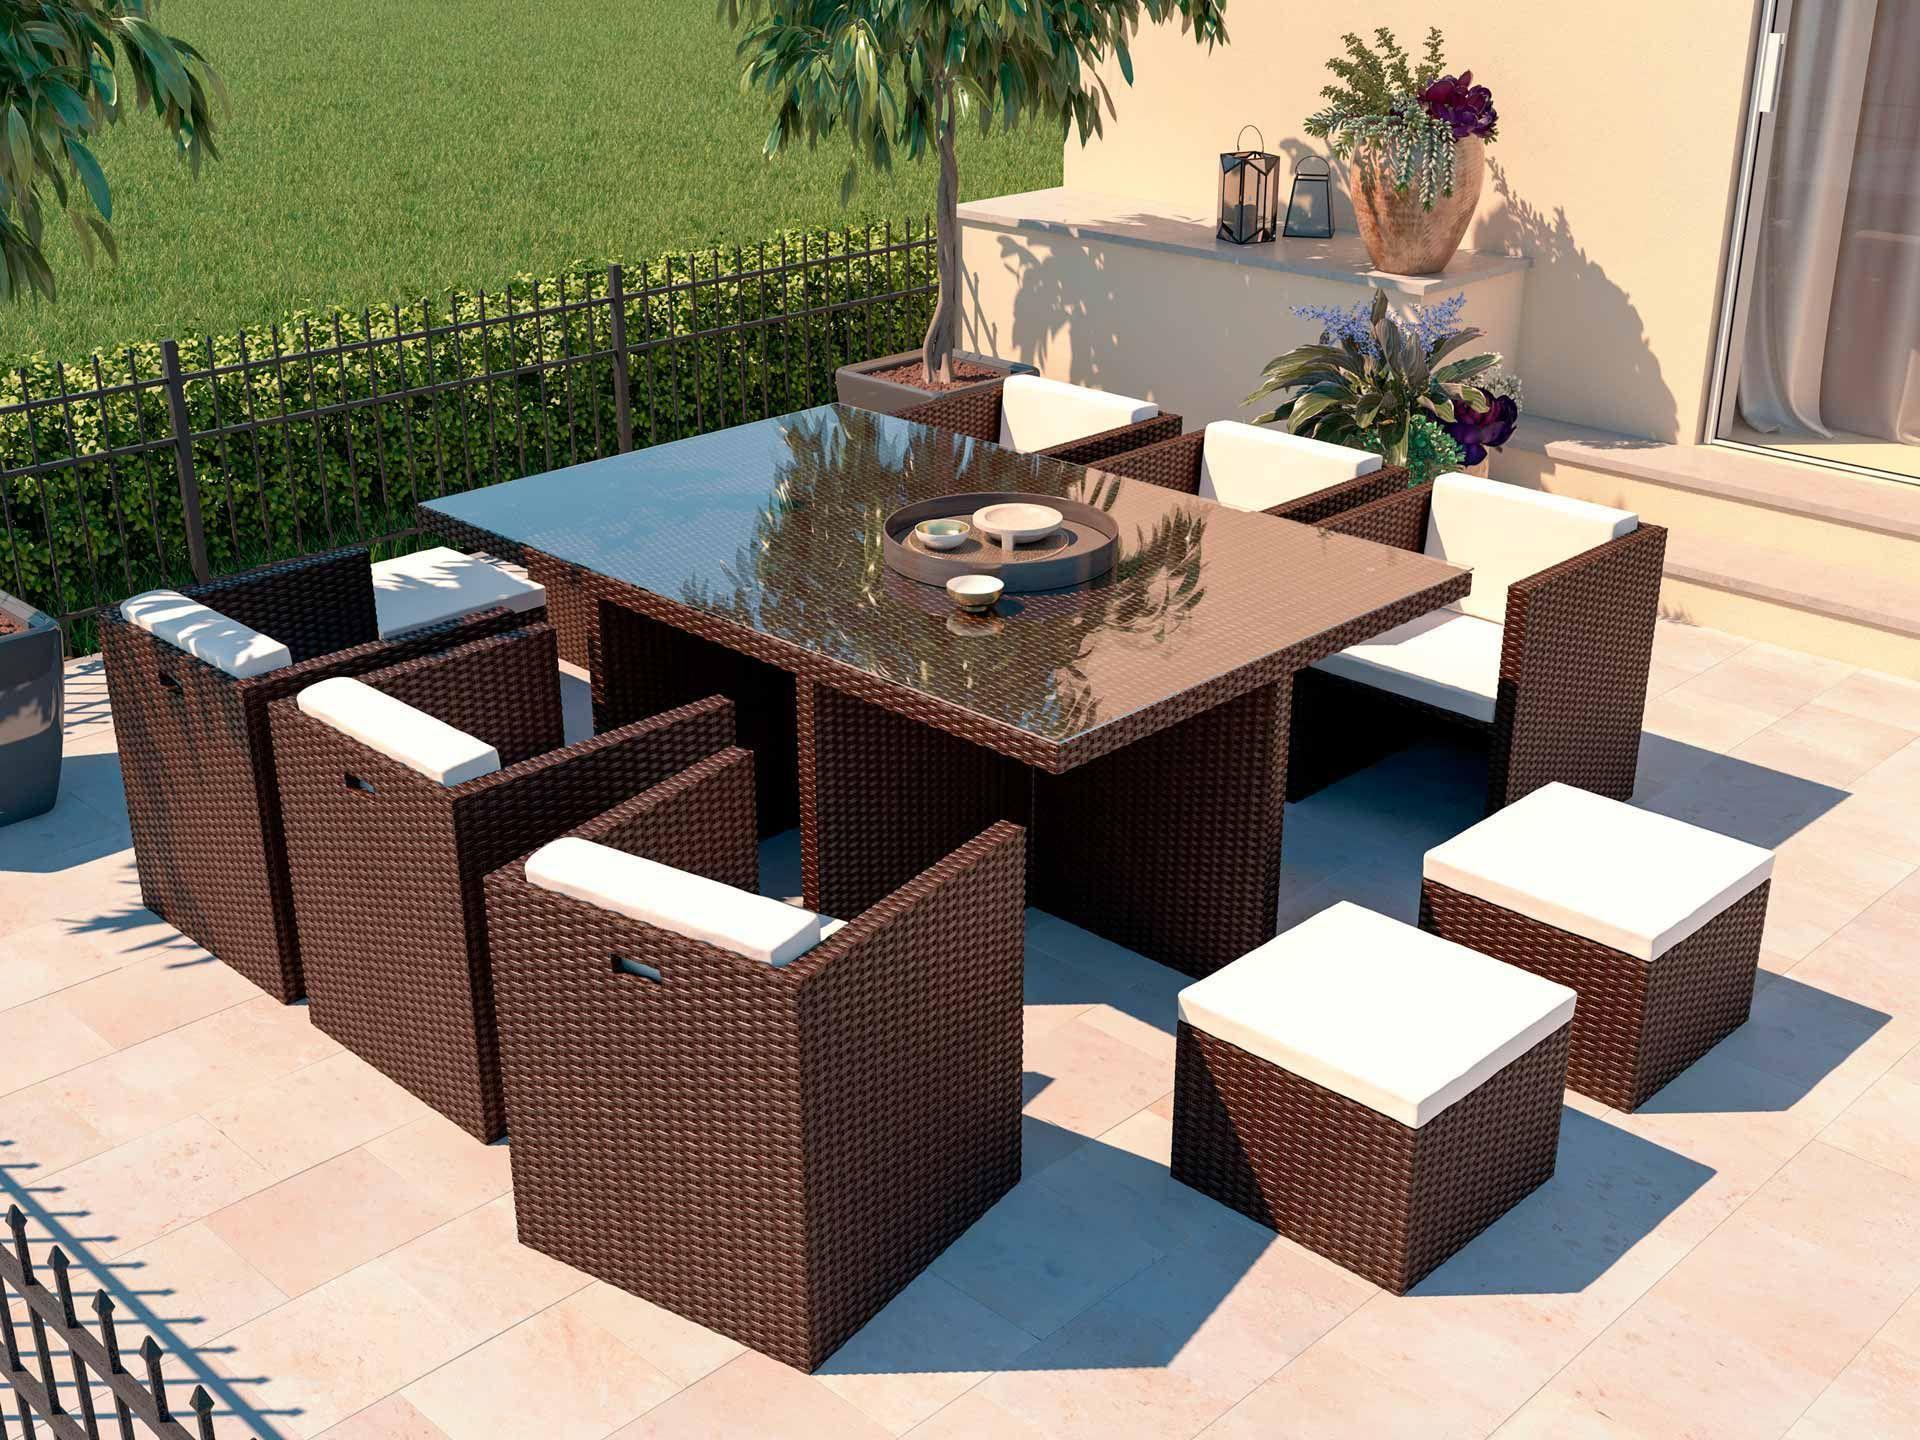 Boreas L   Polyrattan sitzgruppe, Außenmöbel, Sitzgruppe